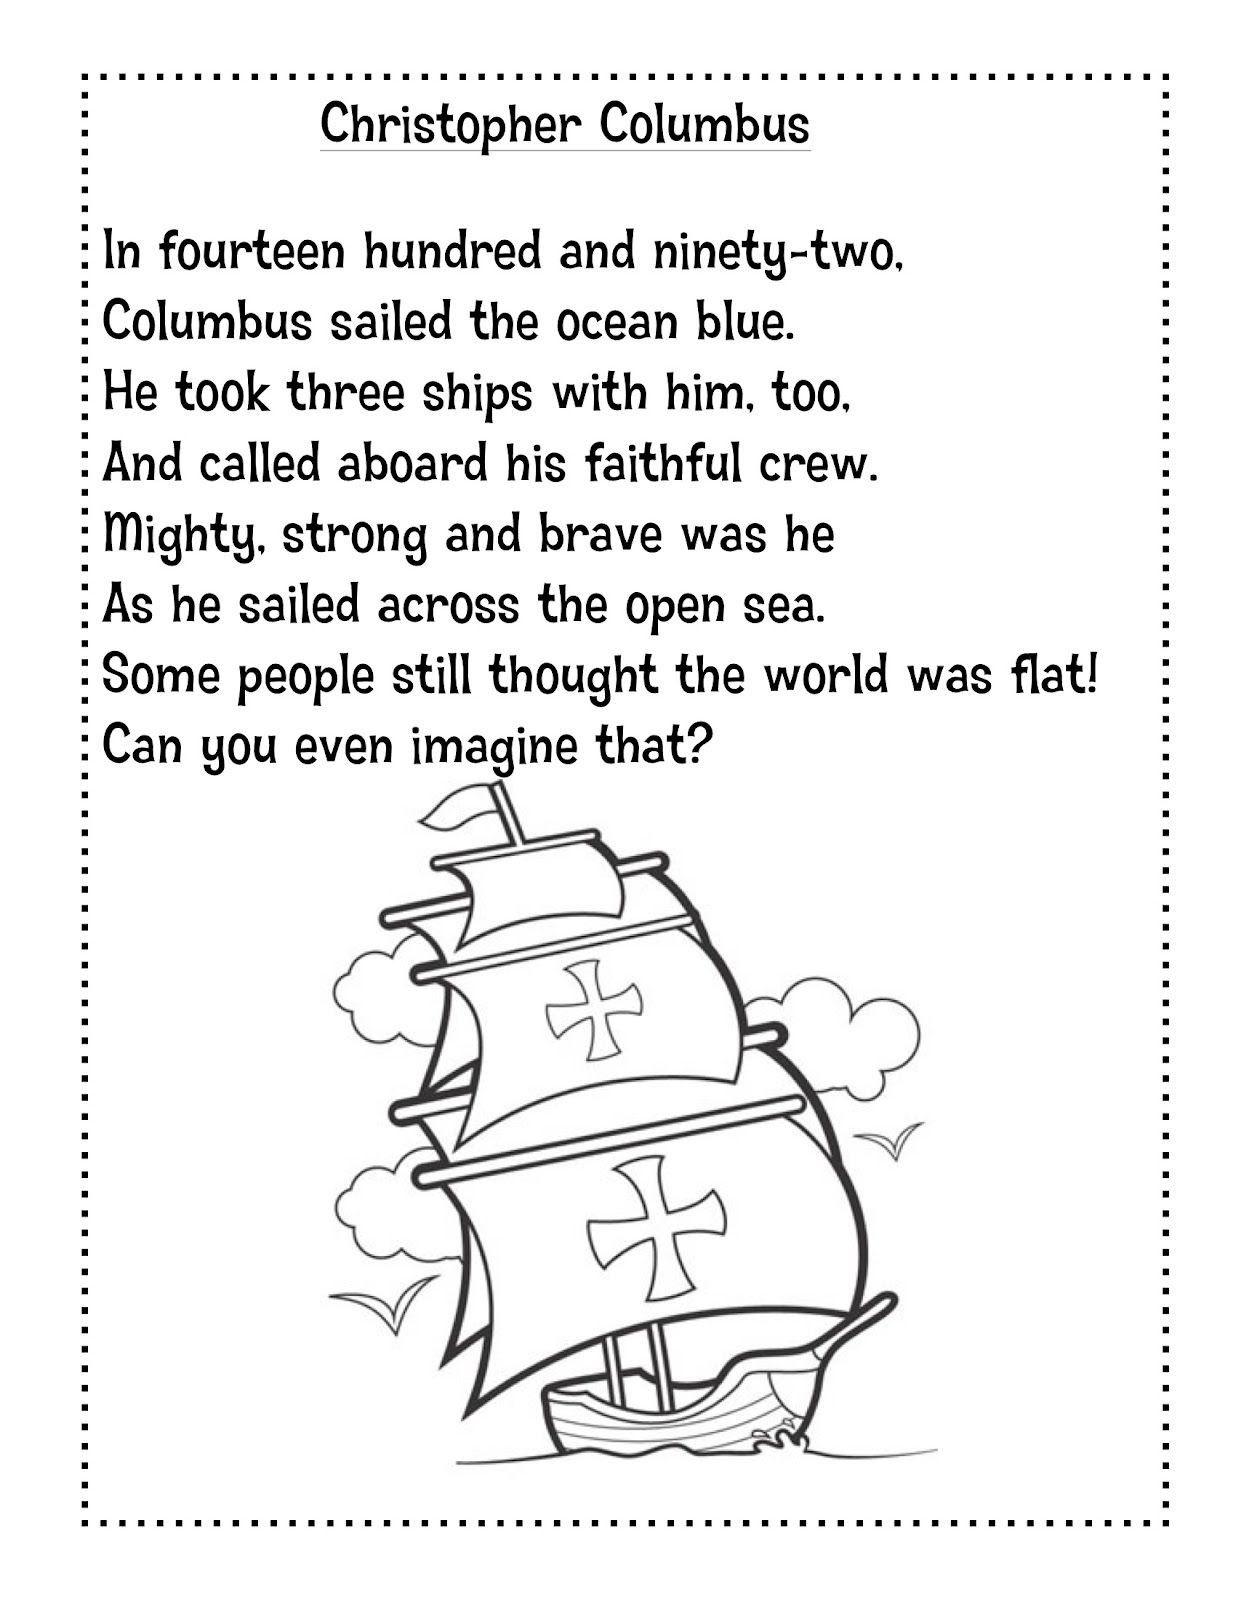 Christopher Columbus Worksheets For Kindergarten Worksheet For Kindergarten Kindergarten Social Studies Christopher Columbus Worksheets Kindergarten Worksheets Printable